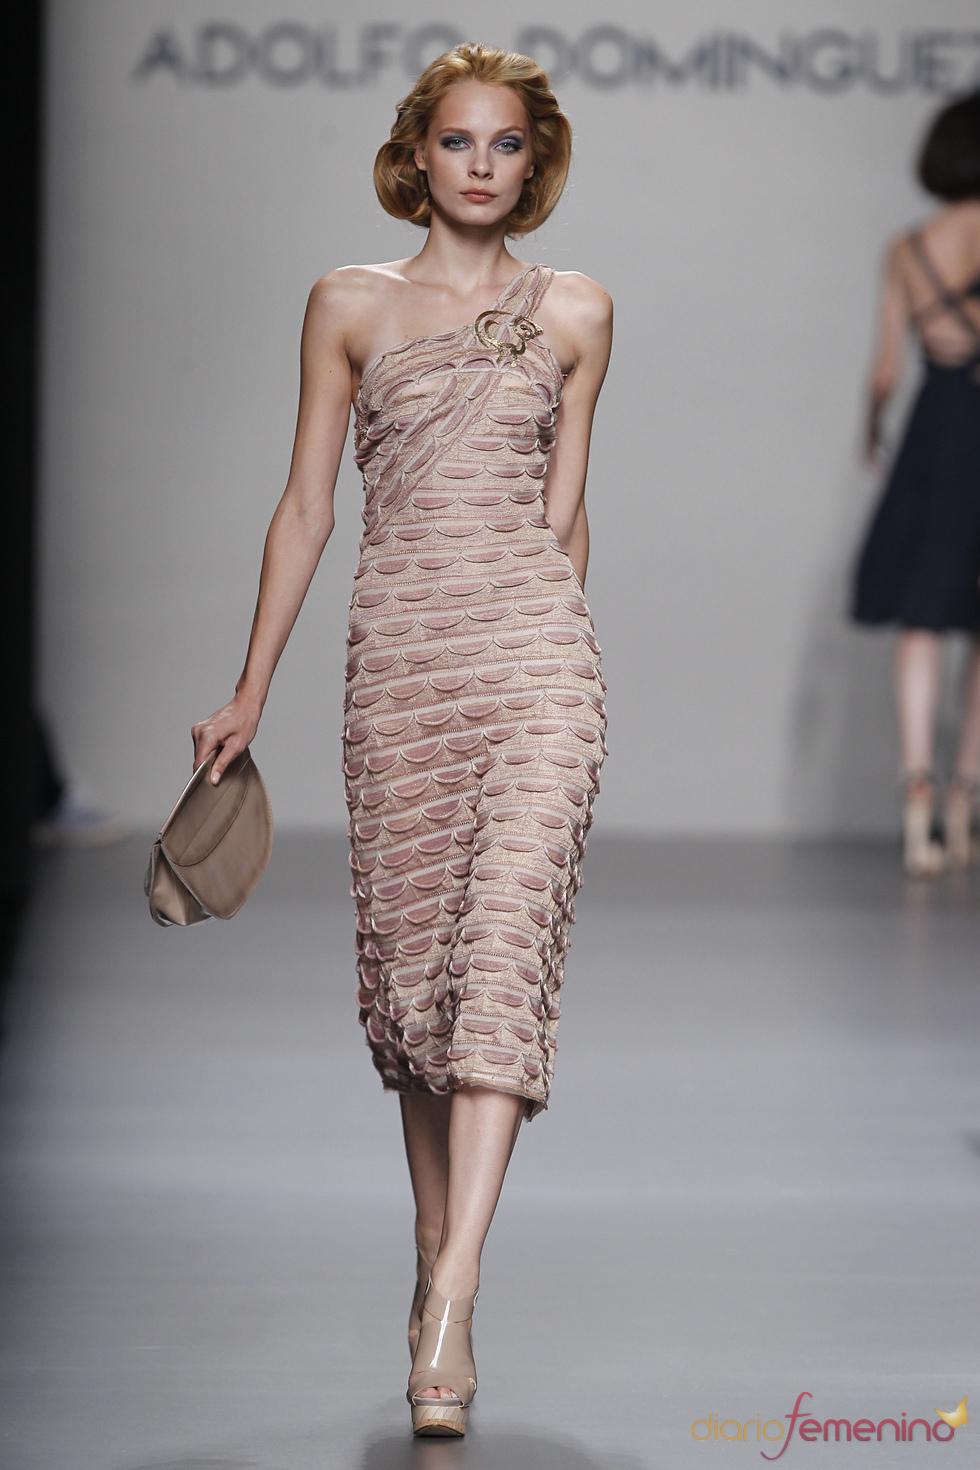 Maxivestido de Adolfo Domínguez para la Madrid Fashion Week